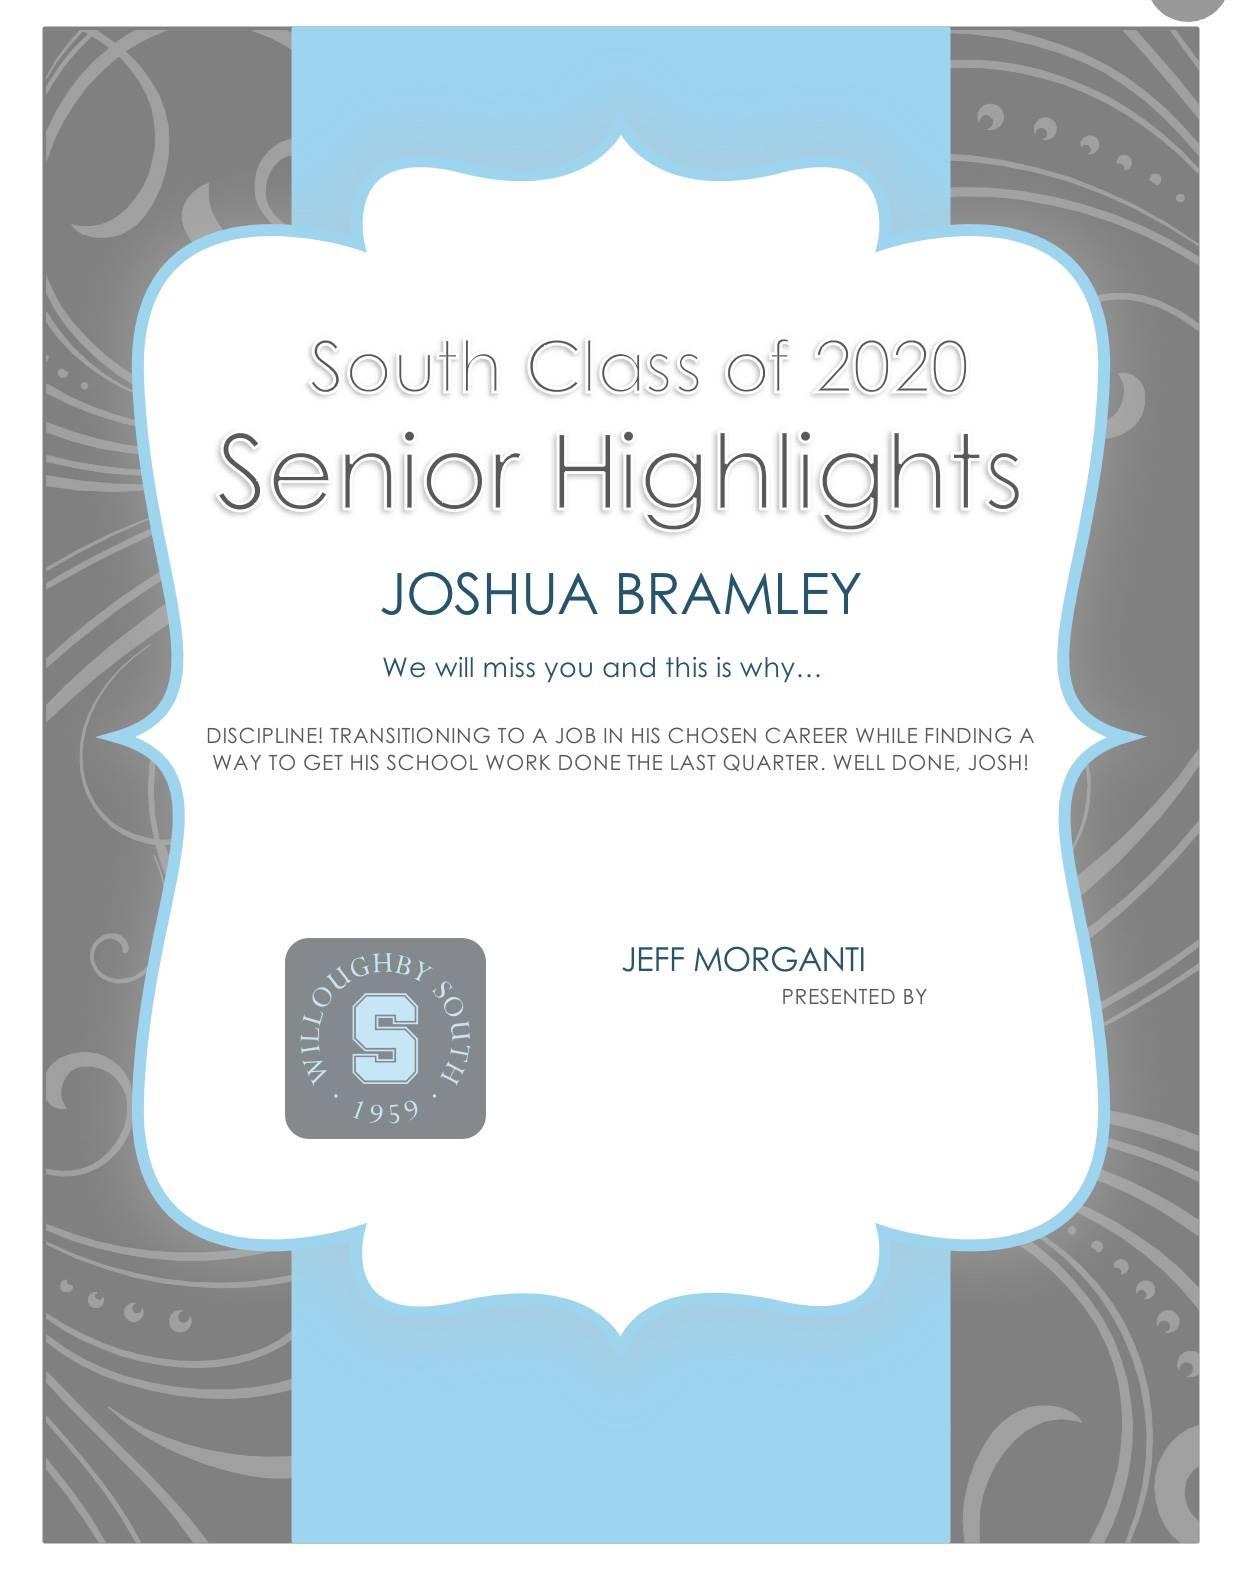 Joshua Bramley